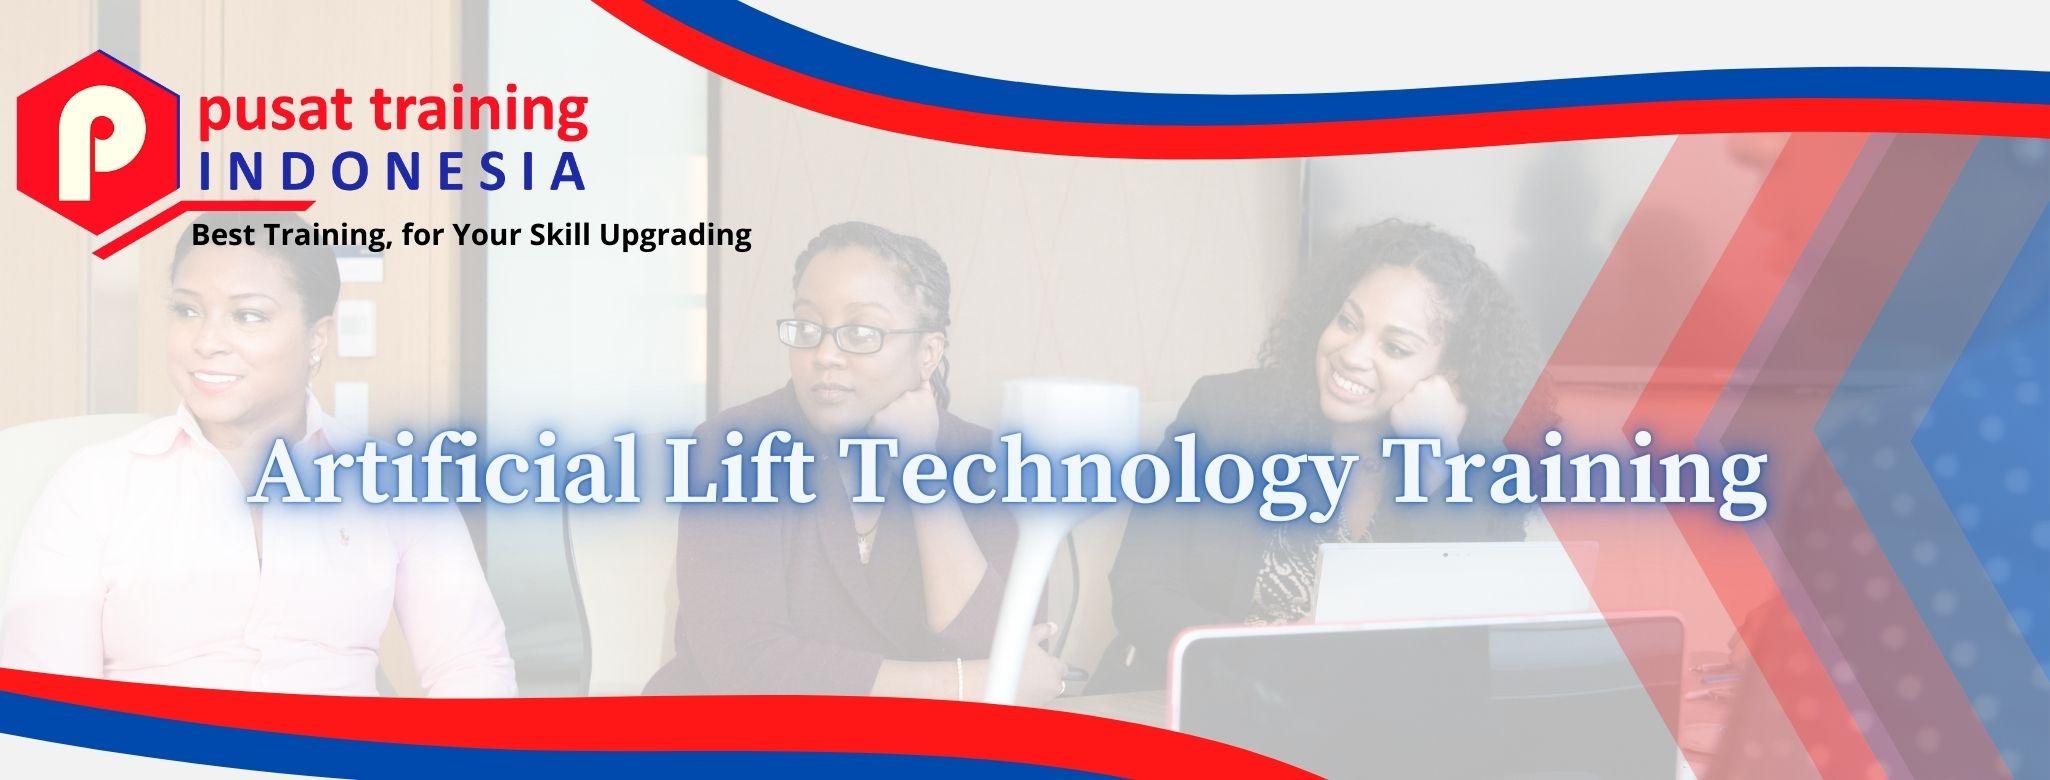 Artificial-Lift-Technology-Training